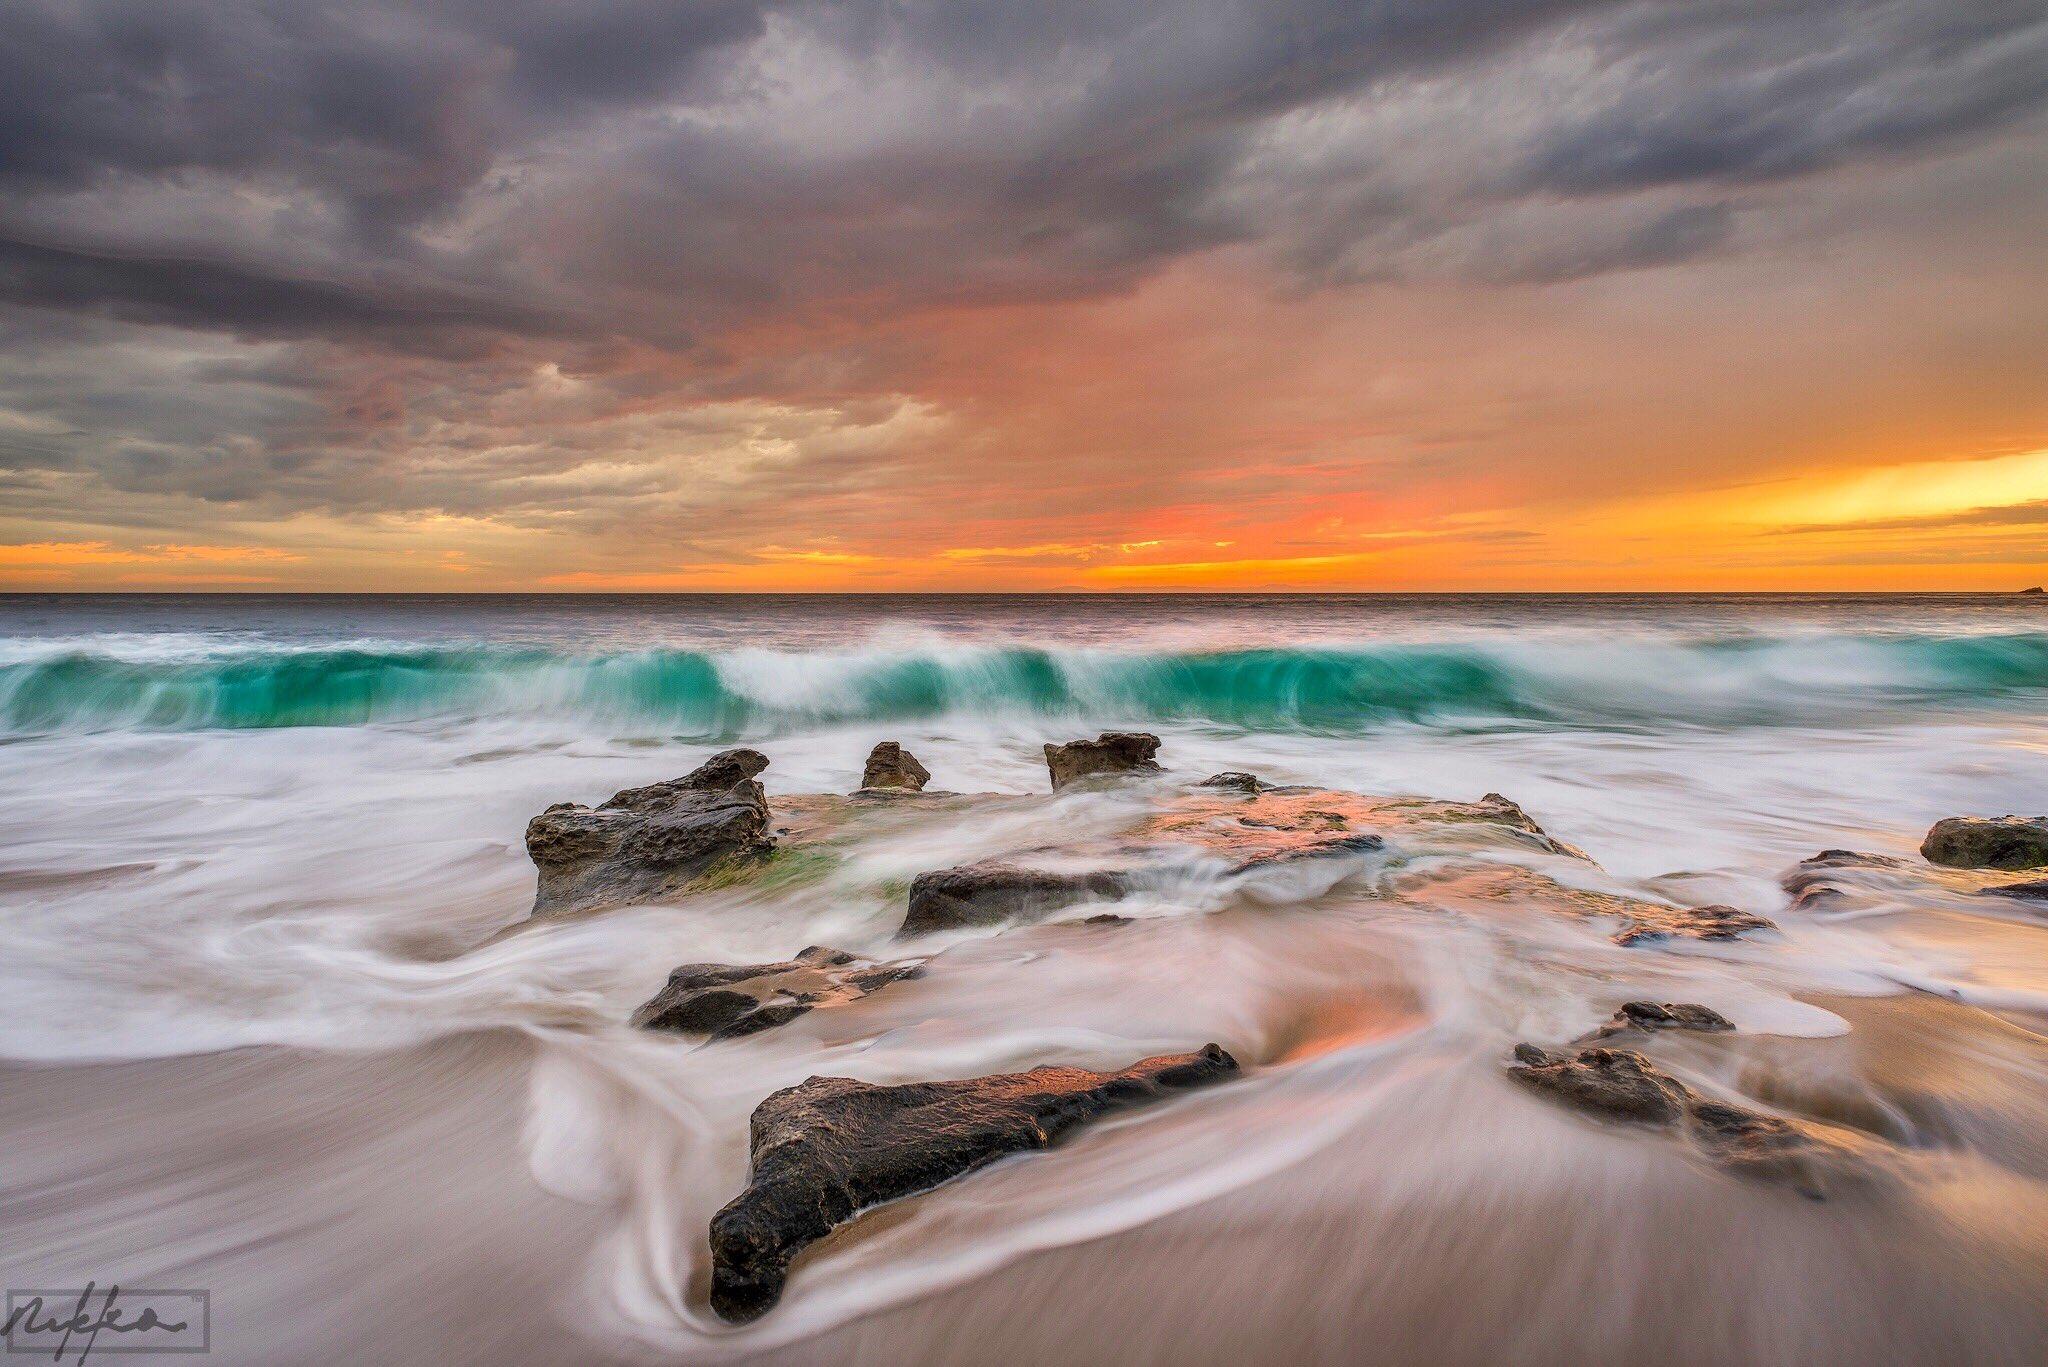 Laguna Beach Photo of the Week: After the Storm | Laguna Beach, CA Patch